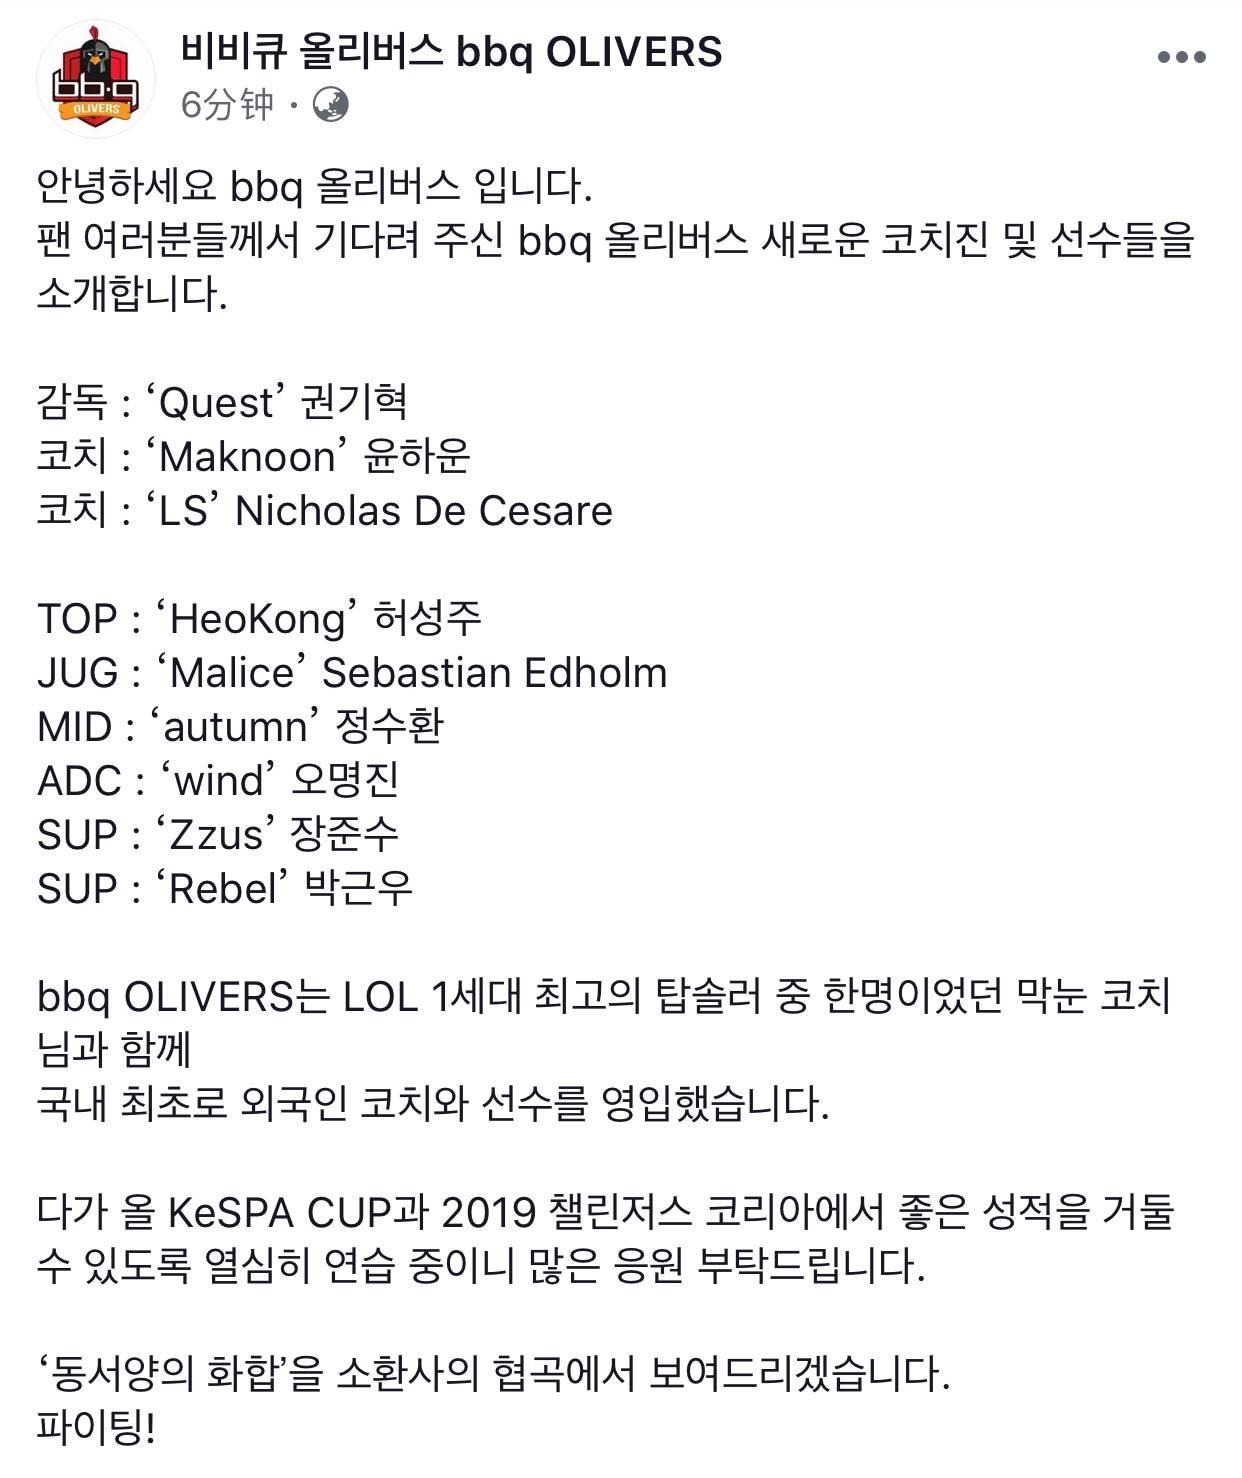 BBQ公布新阵容:韩国首次引入外国教练与选手